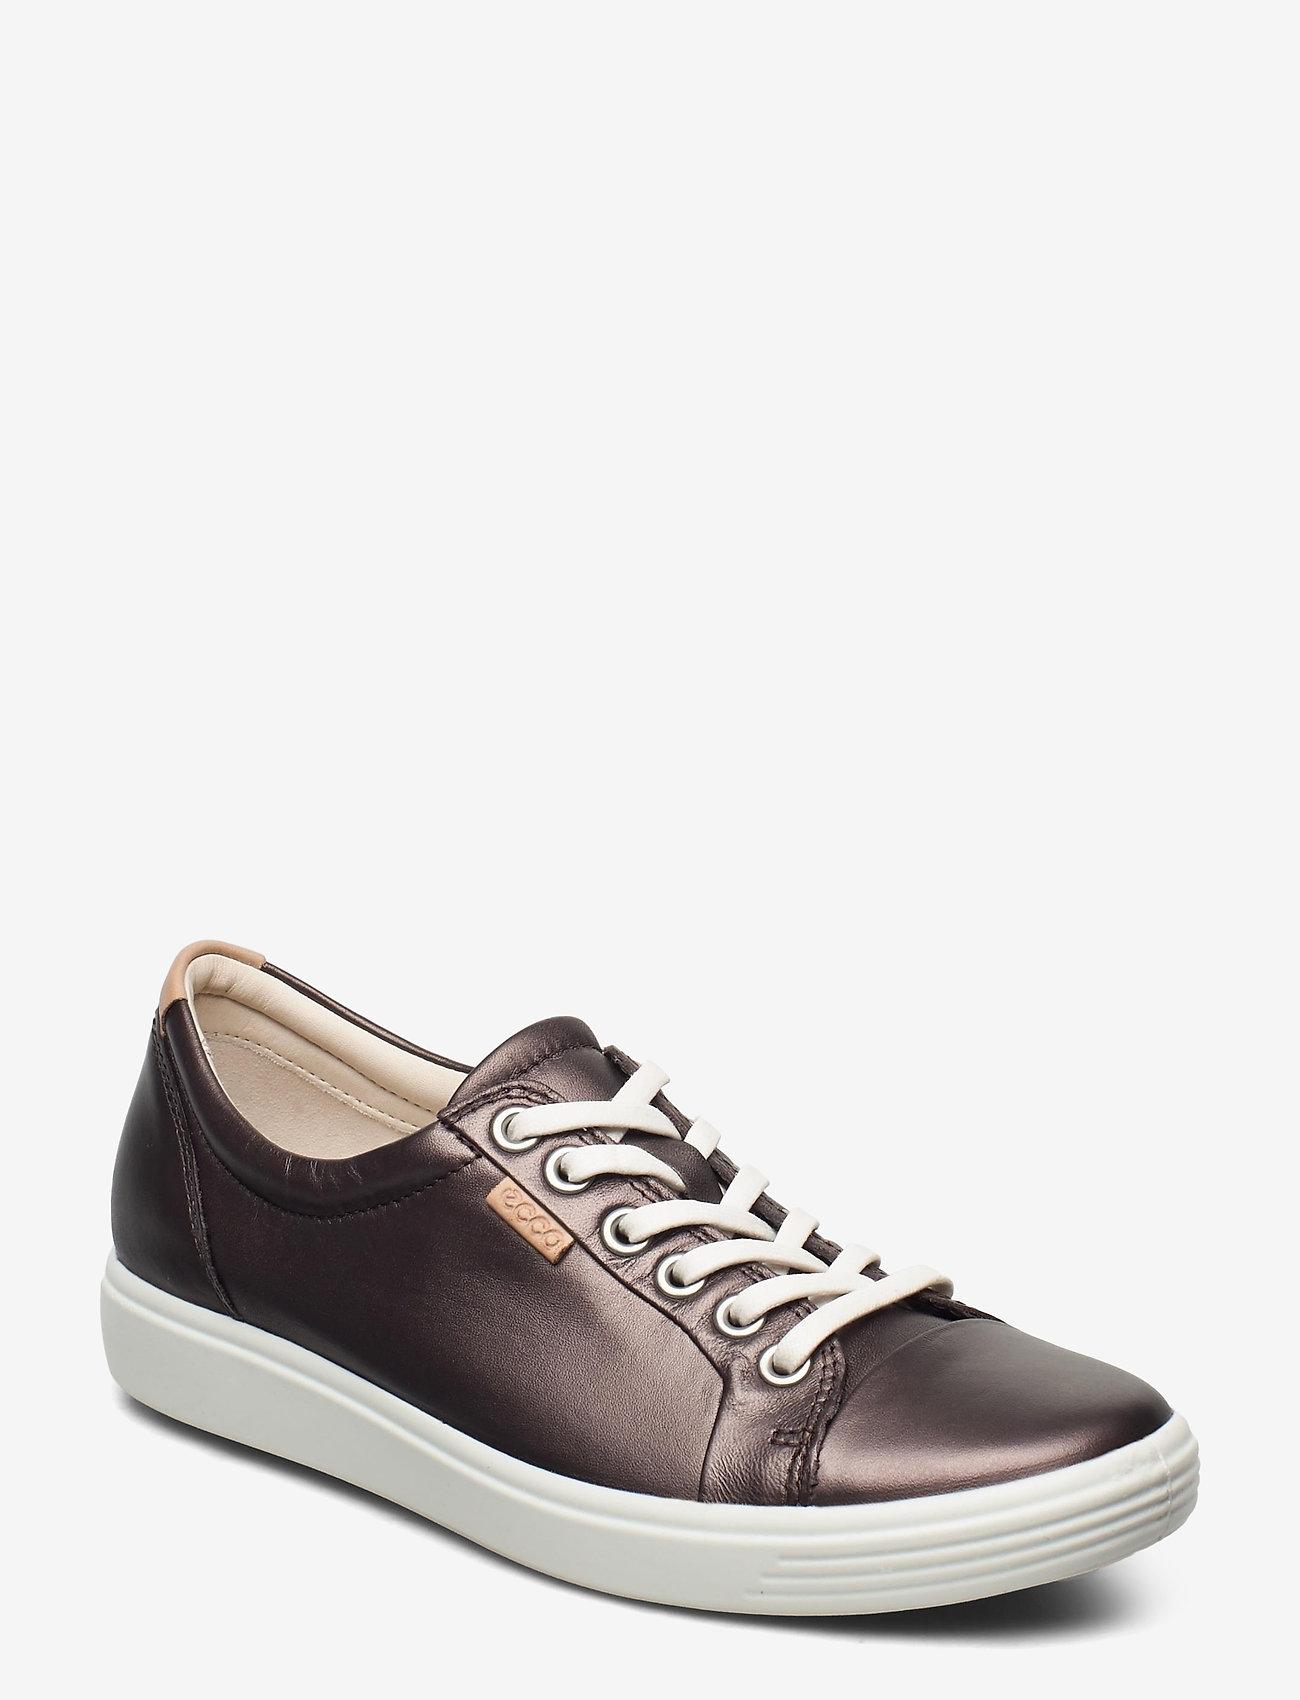 ECCO - SOFT 7 W - låga sneakers - shale metallic - 0